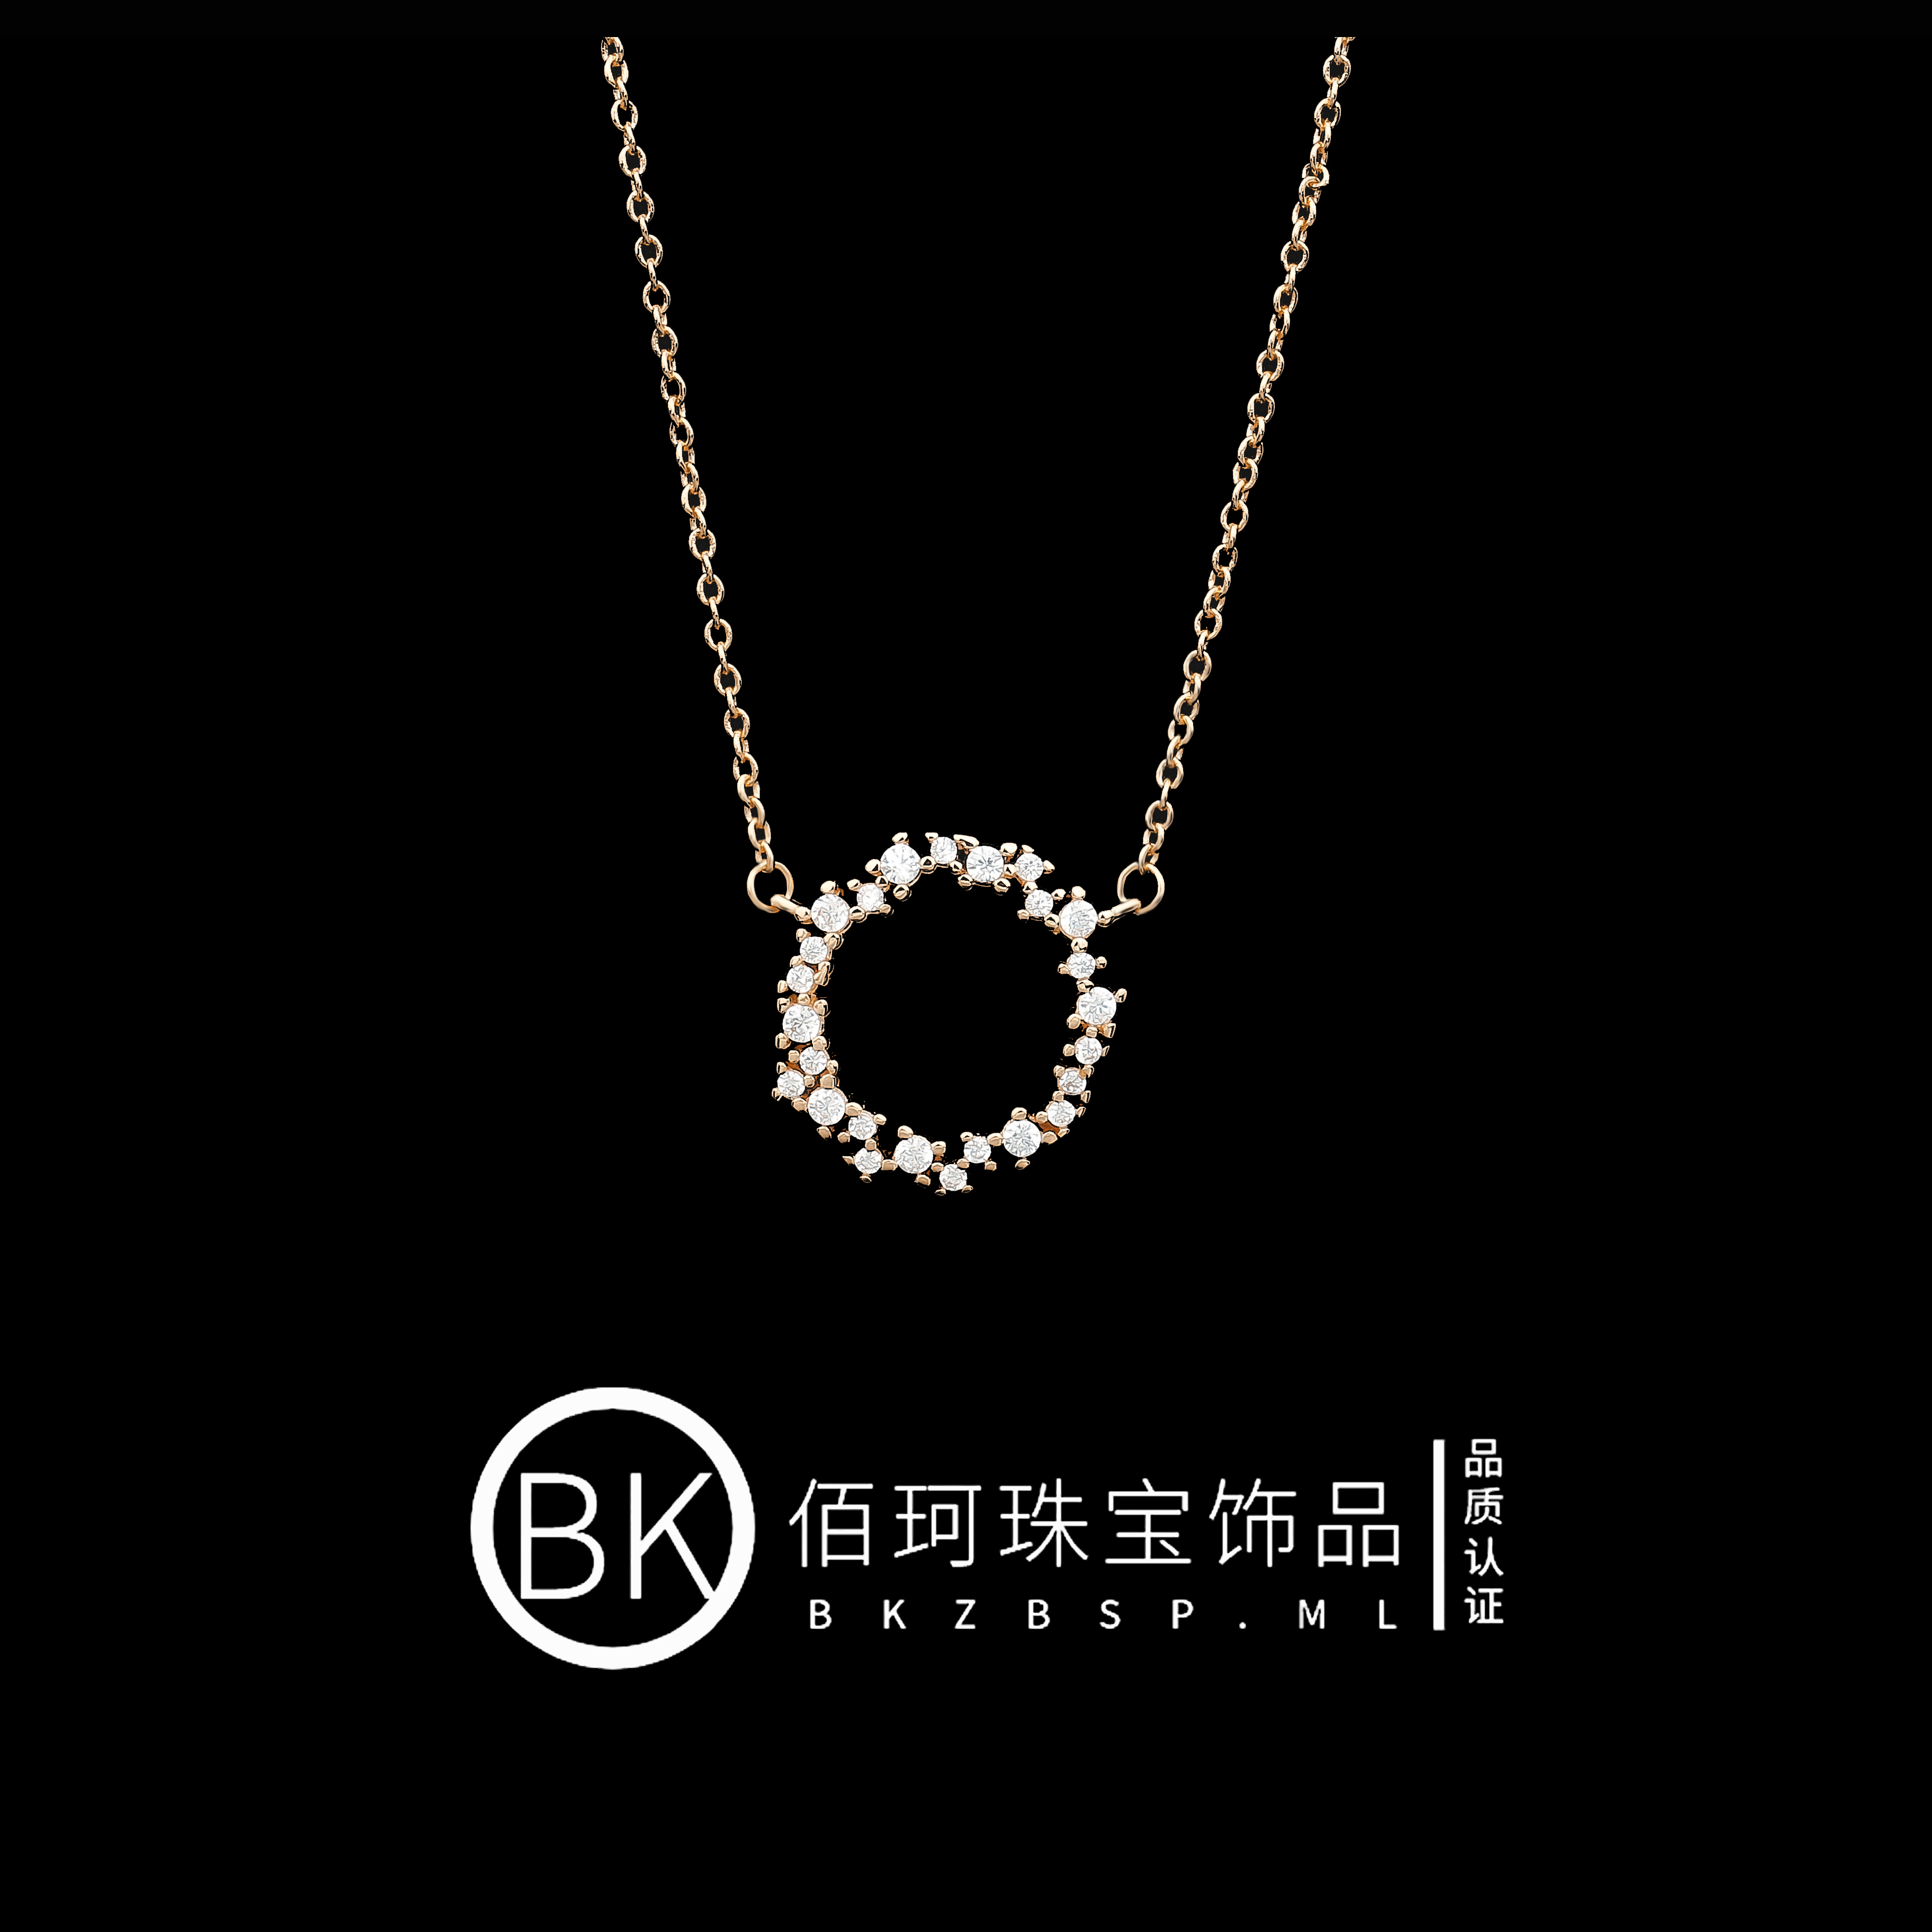 Chomel Singapore Fashion Necklace brand design sense concentric circle geometric cross necklace 806